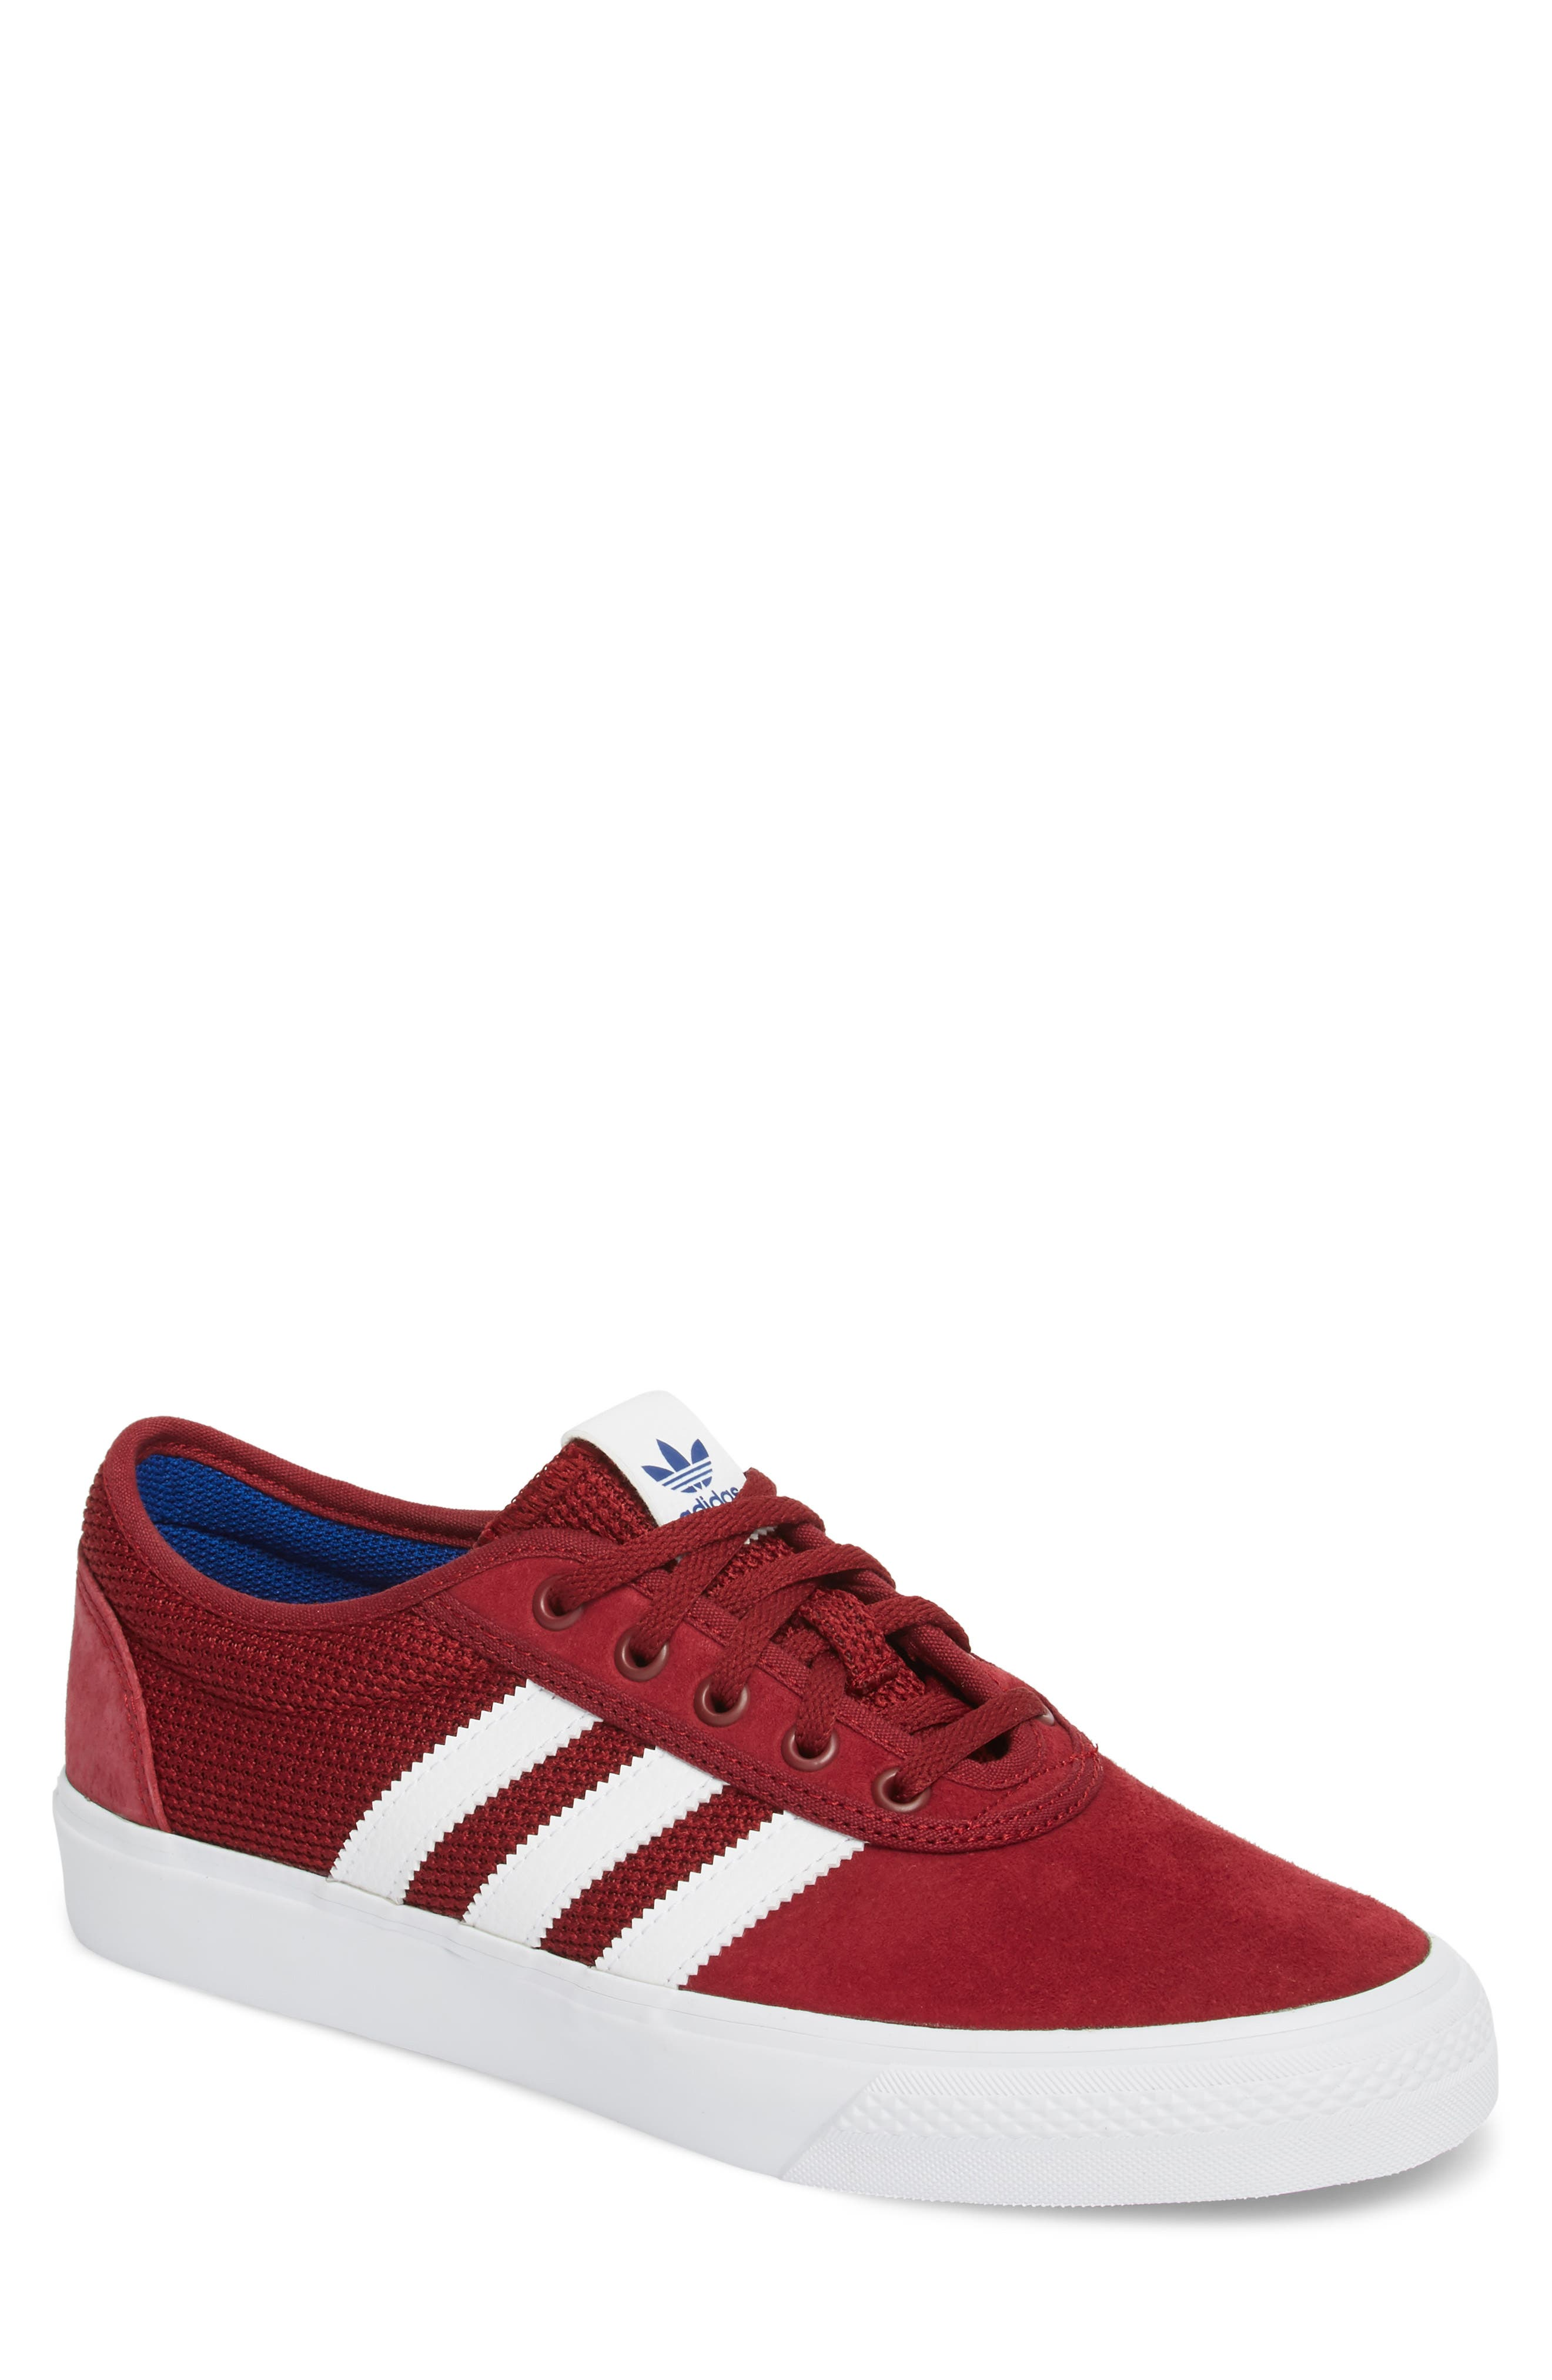 adi-Ease Sneaker,                         Main,                         color, BURGUNDY/ WHITE / ROYAL